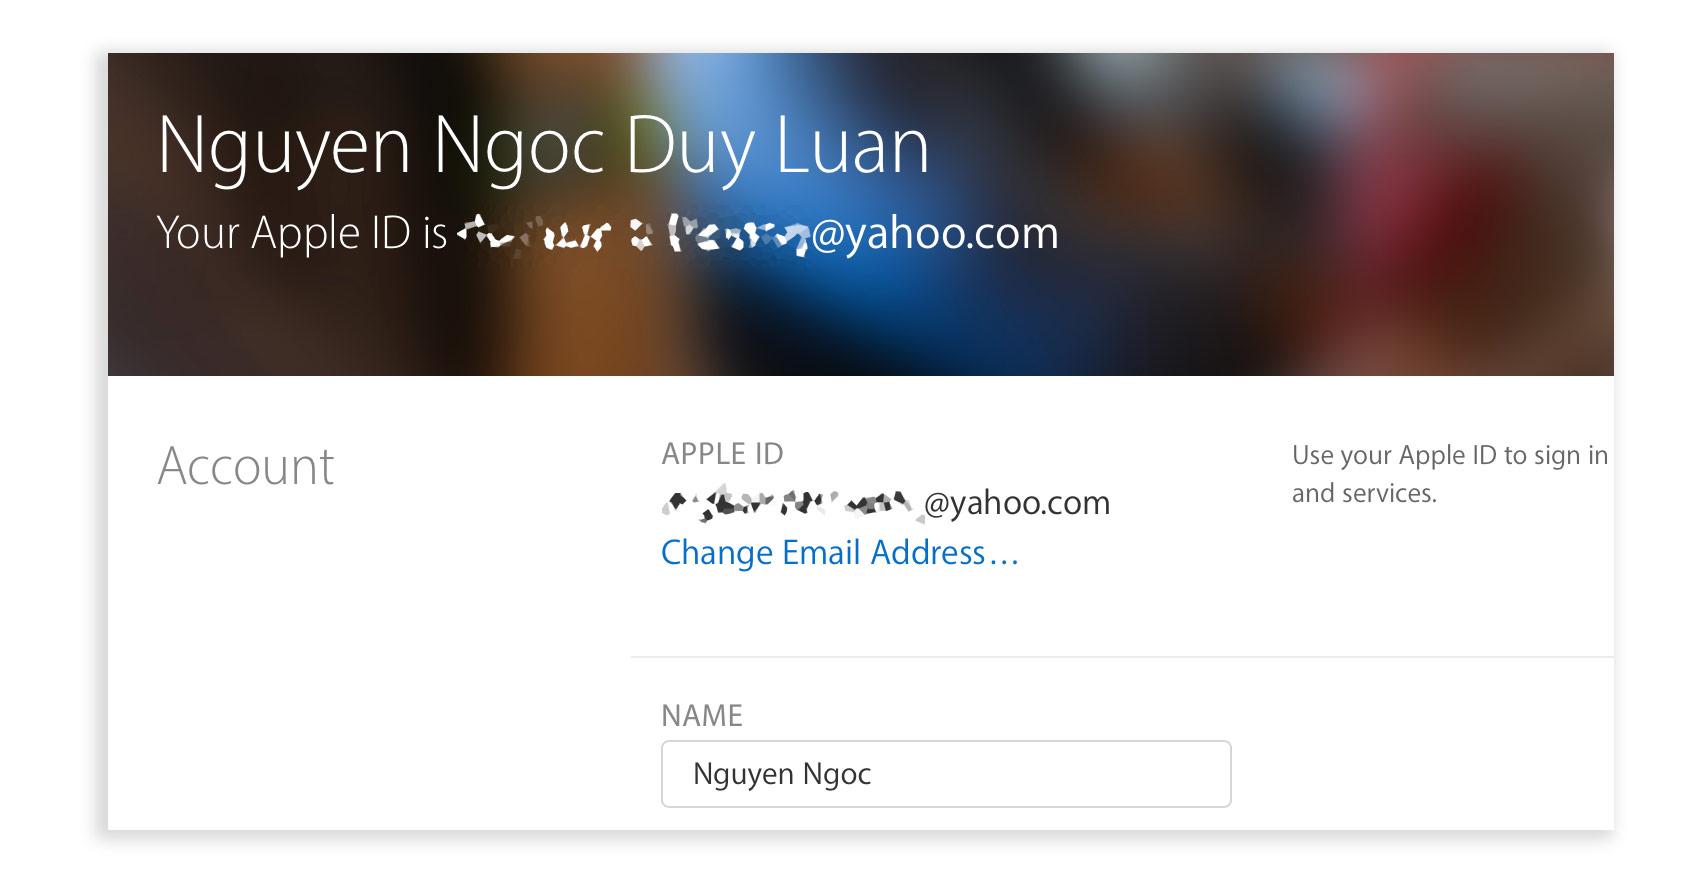 Chuyen_doi_email_Apple_ID_hai_tai_khoan_1.jpg